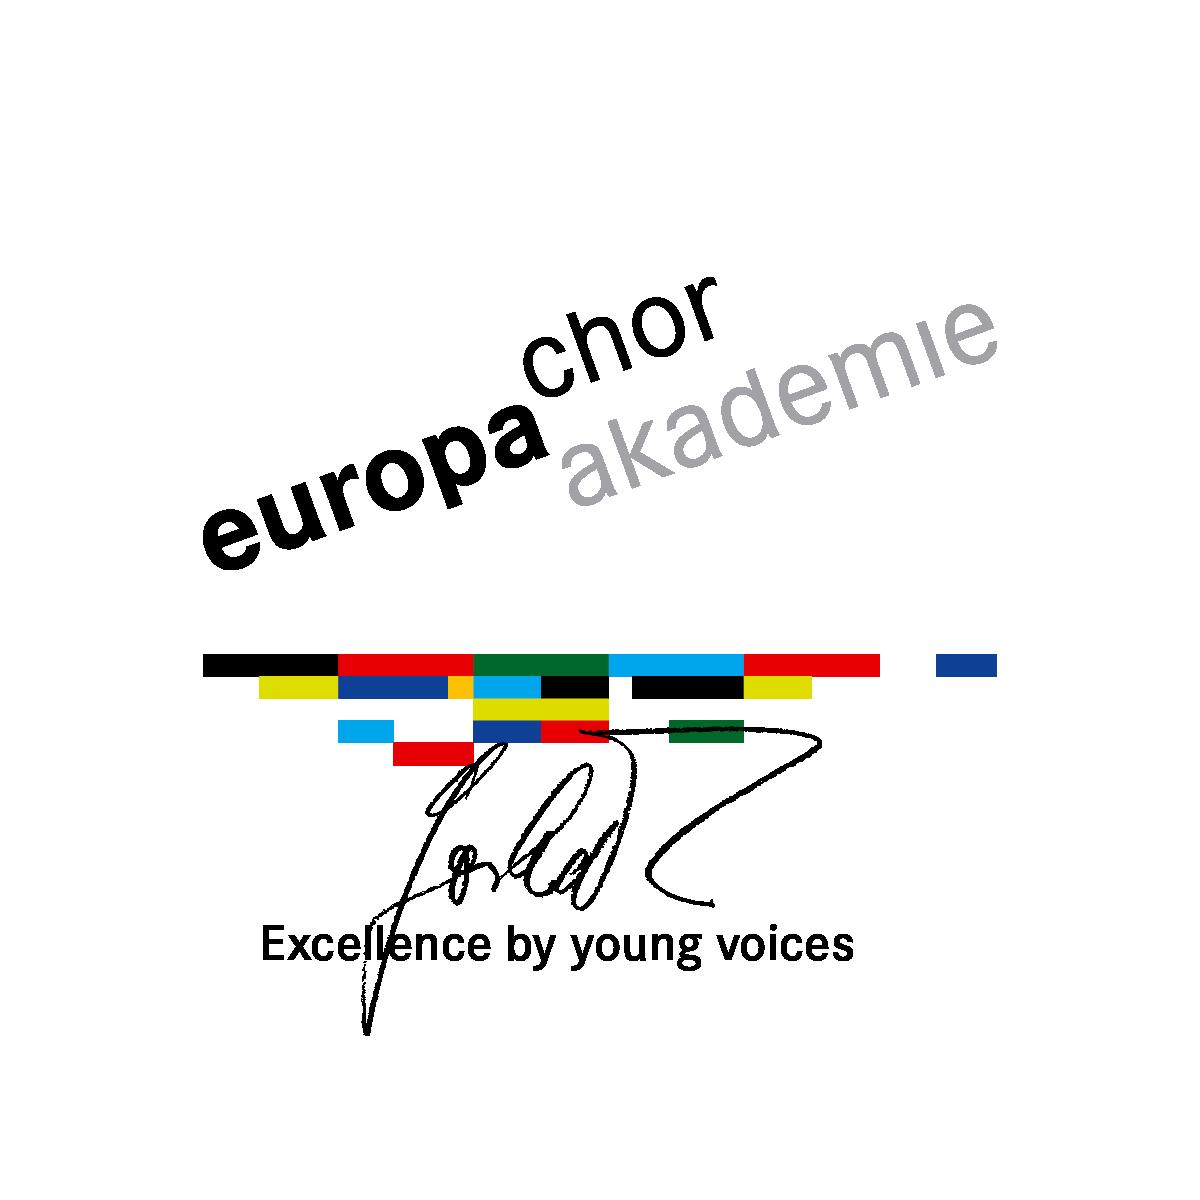 intermar-marketing-corporate-design-europa-chor-akademie-logo.png